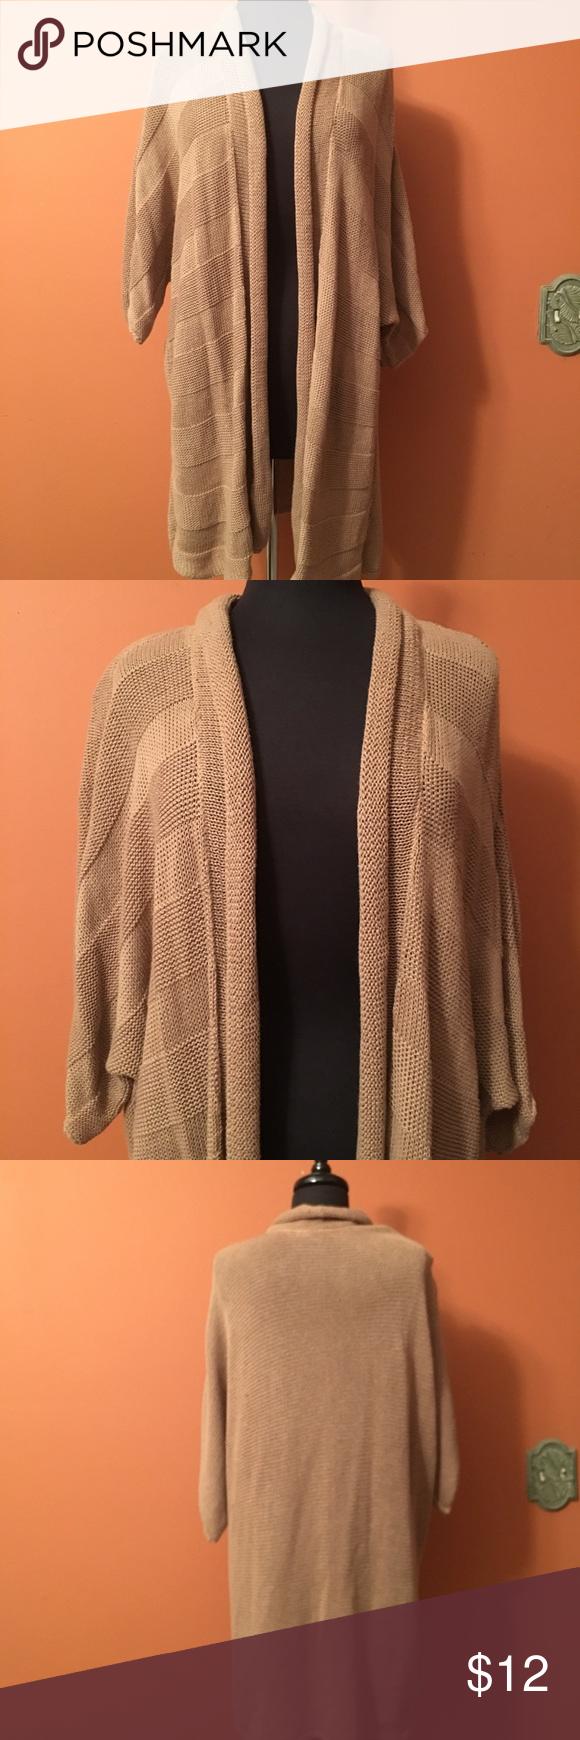 Plus size short sleeve cardigan, size 2X Cute knit oversized ...